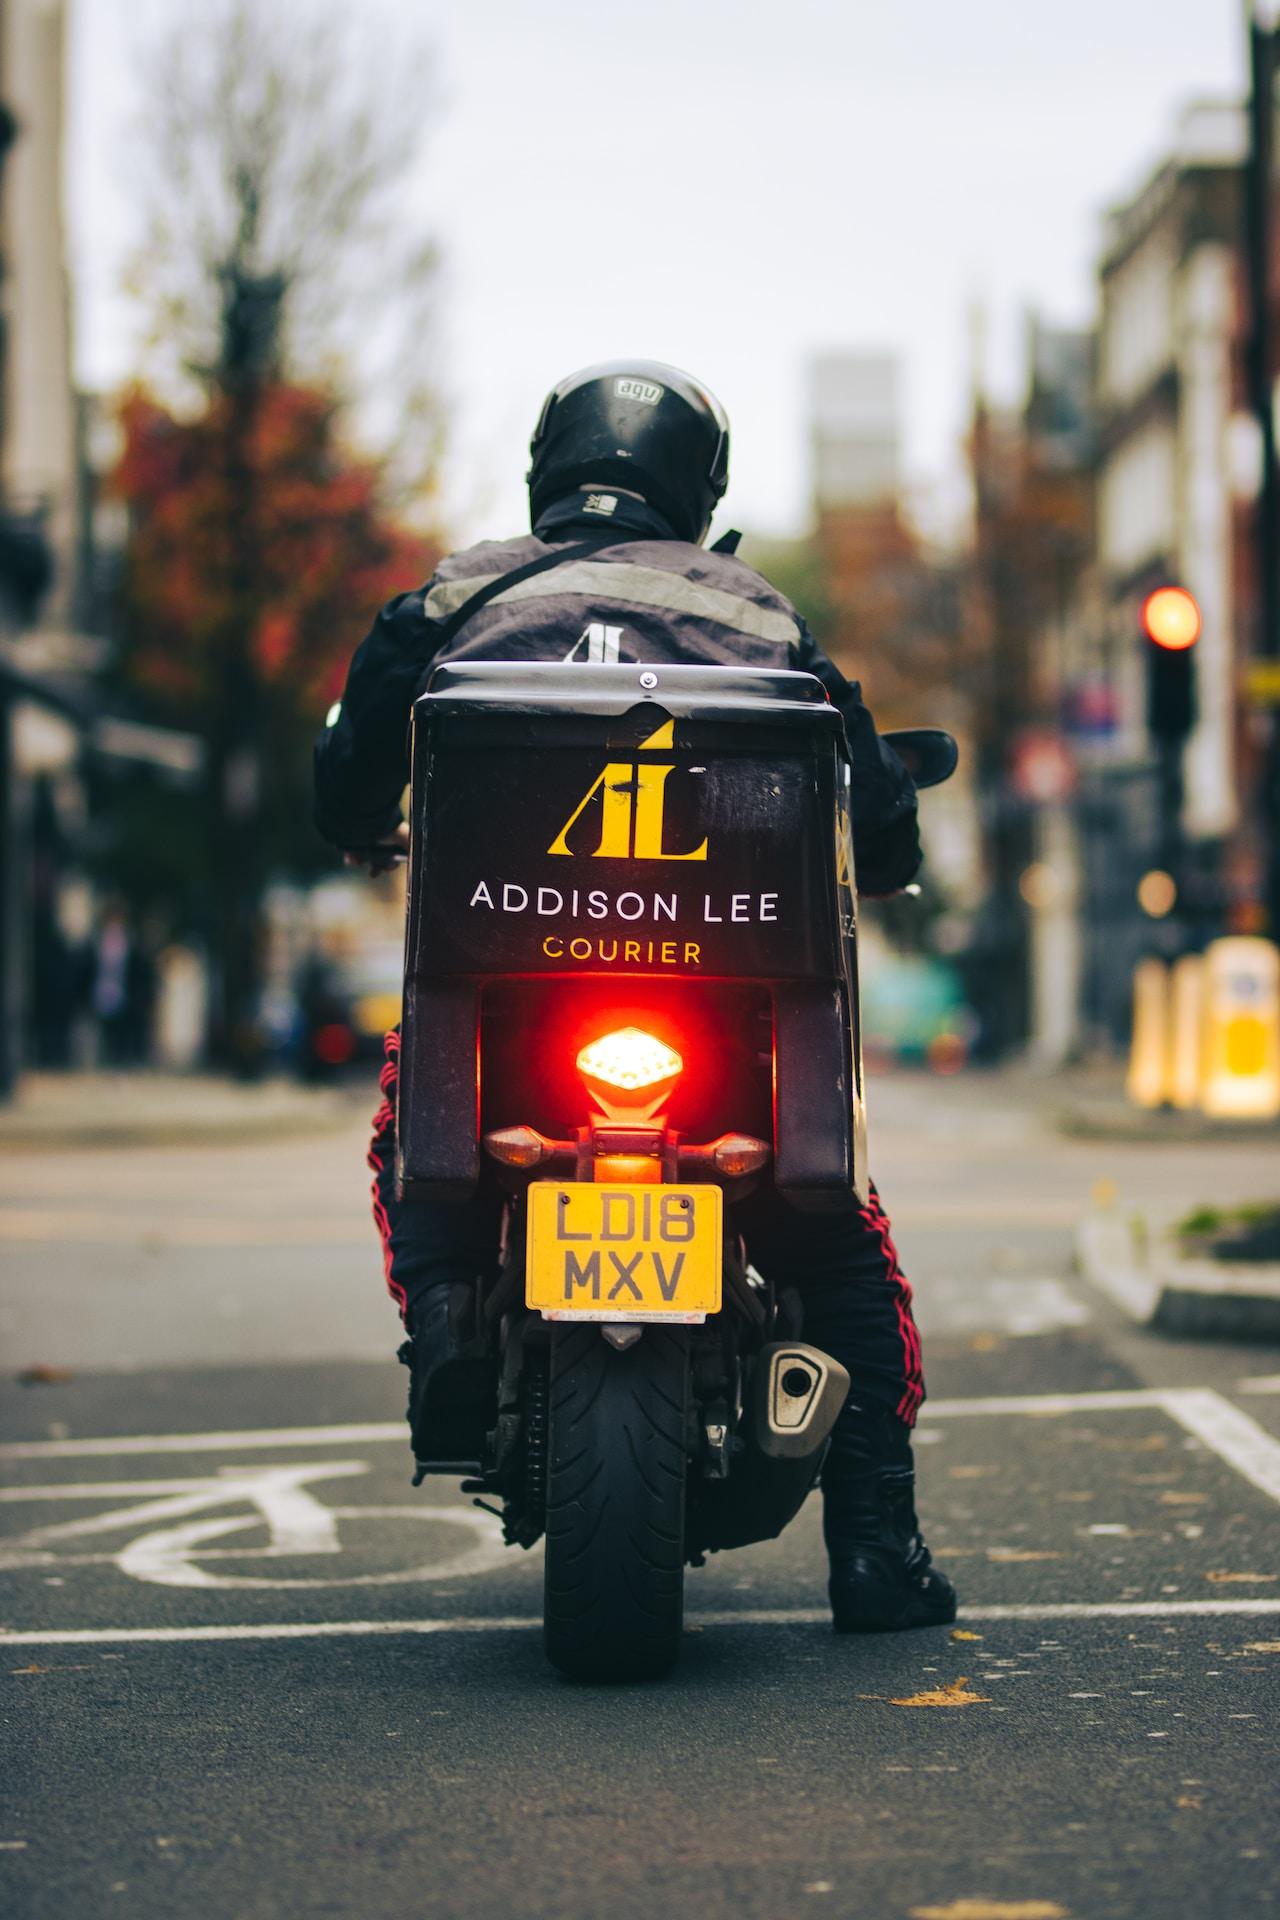 man in black helmet and black jacket with helmet on road during daytime